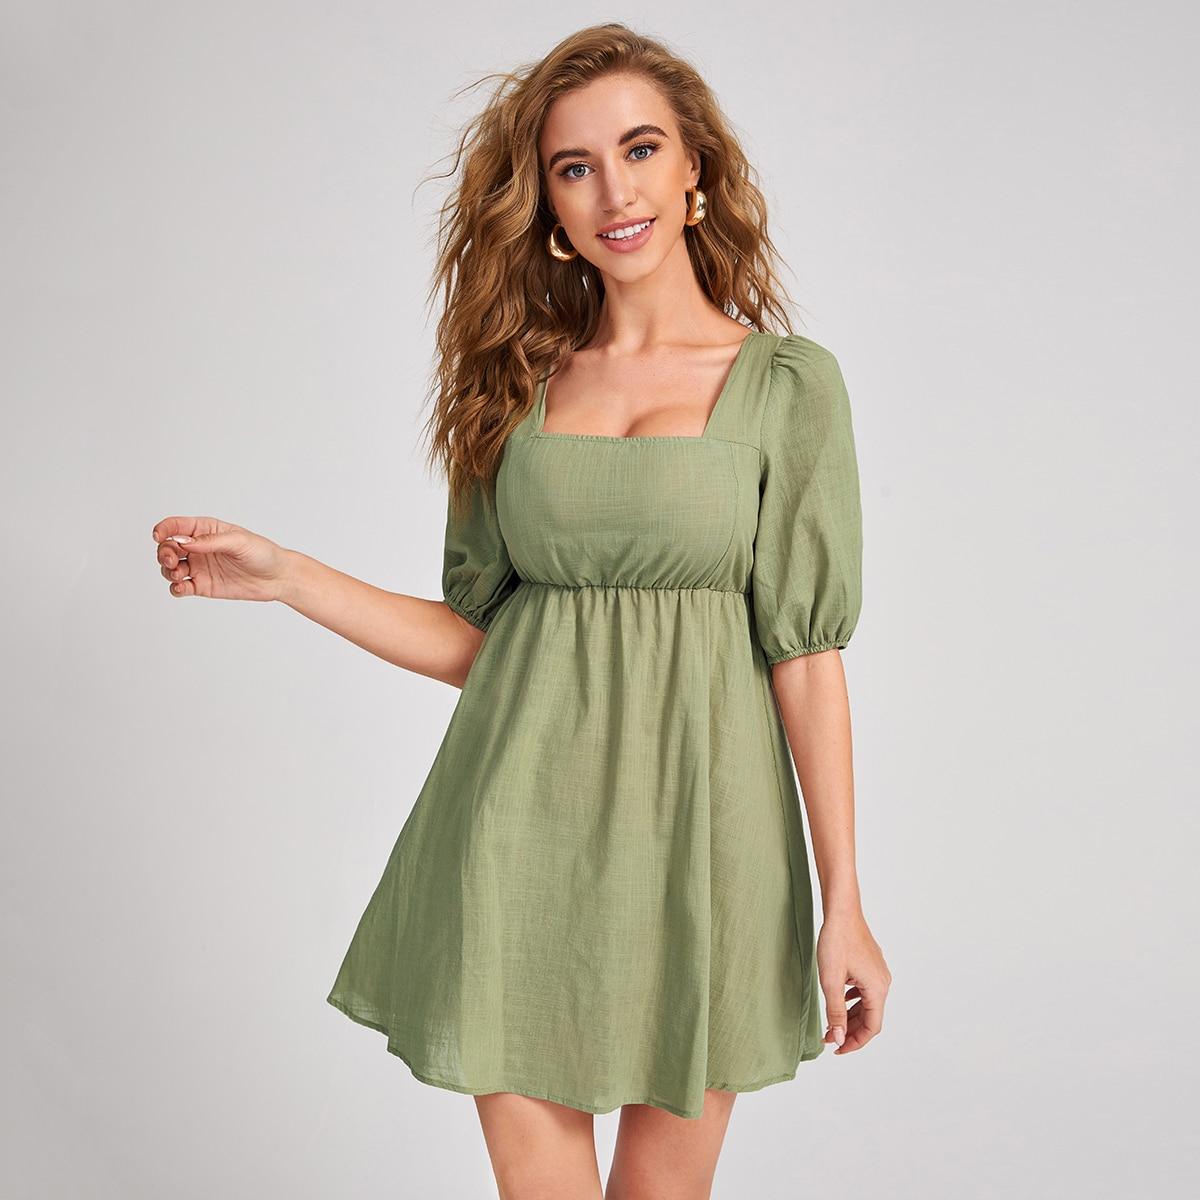 SHEIN / Vestidos Volante fruncido Liso Verde militar Casual